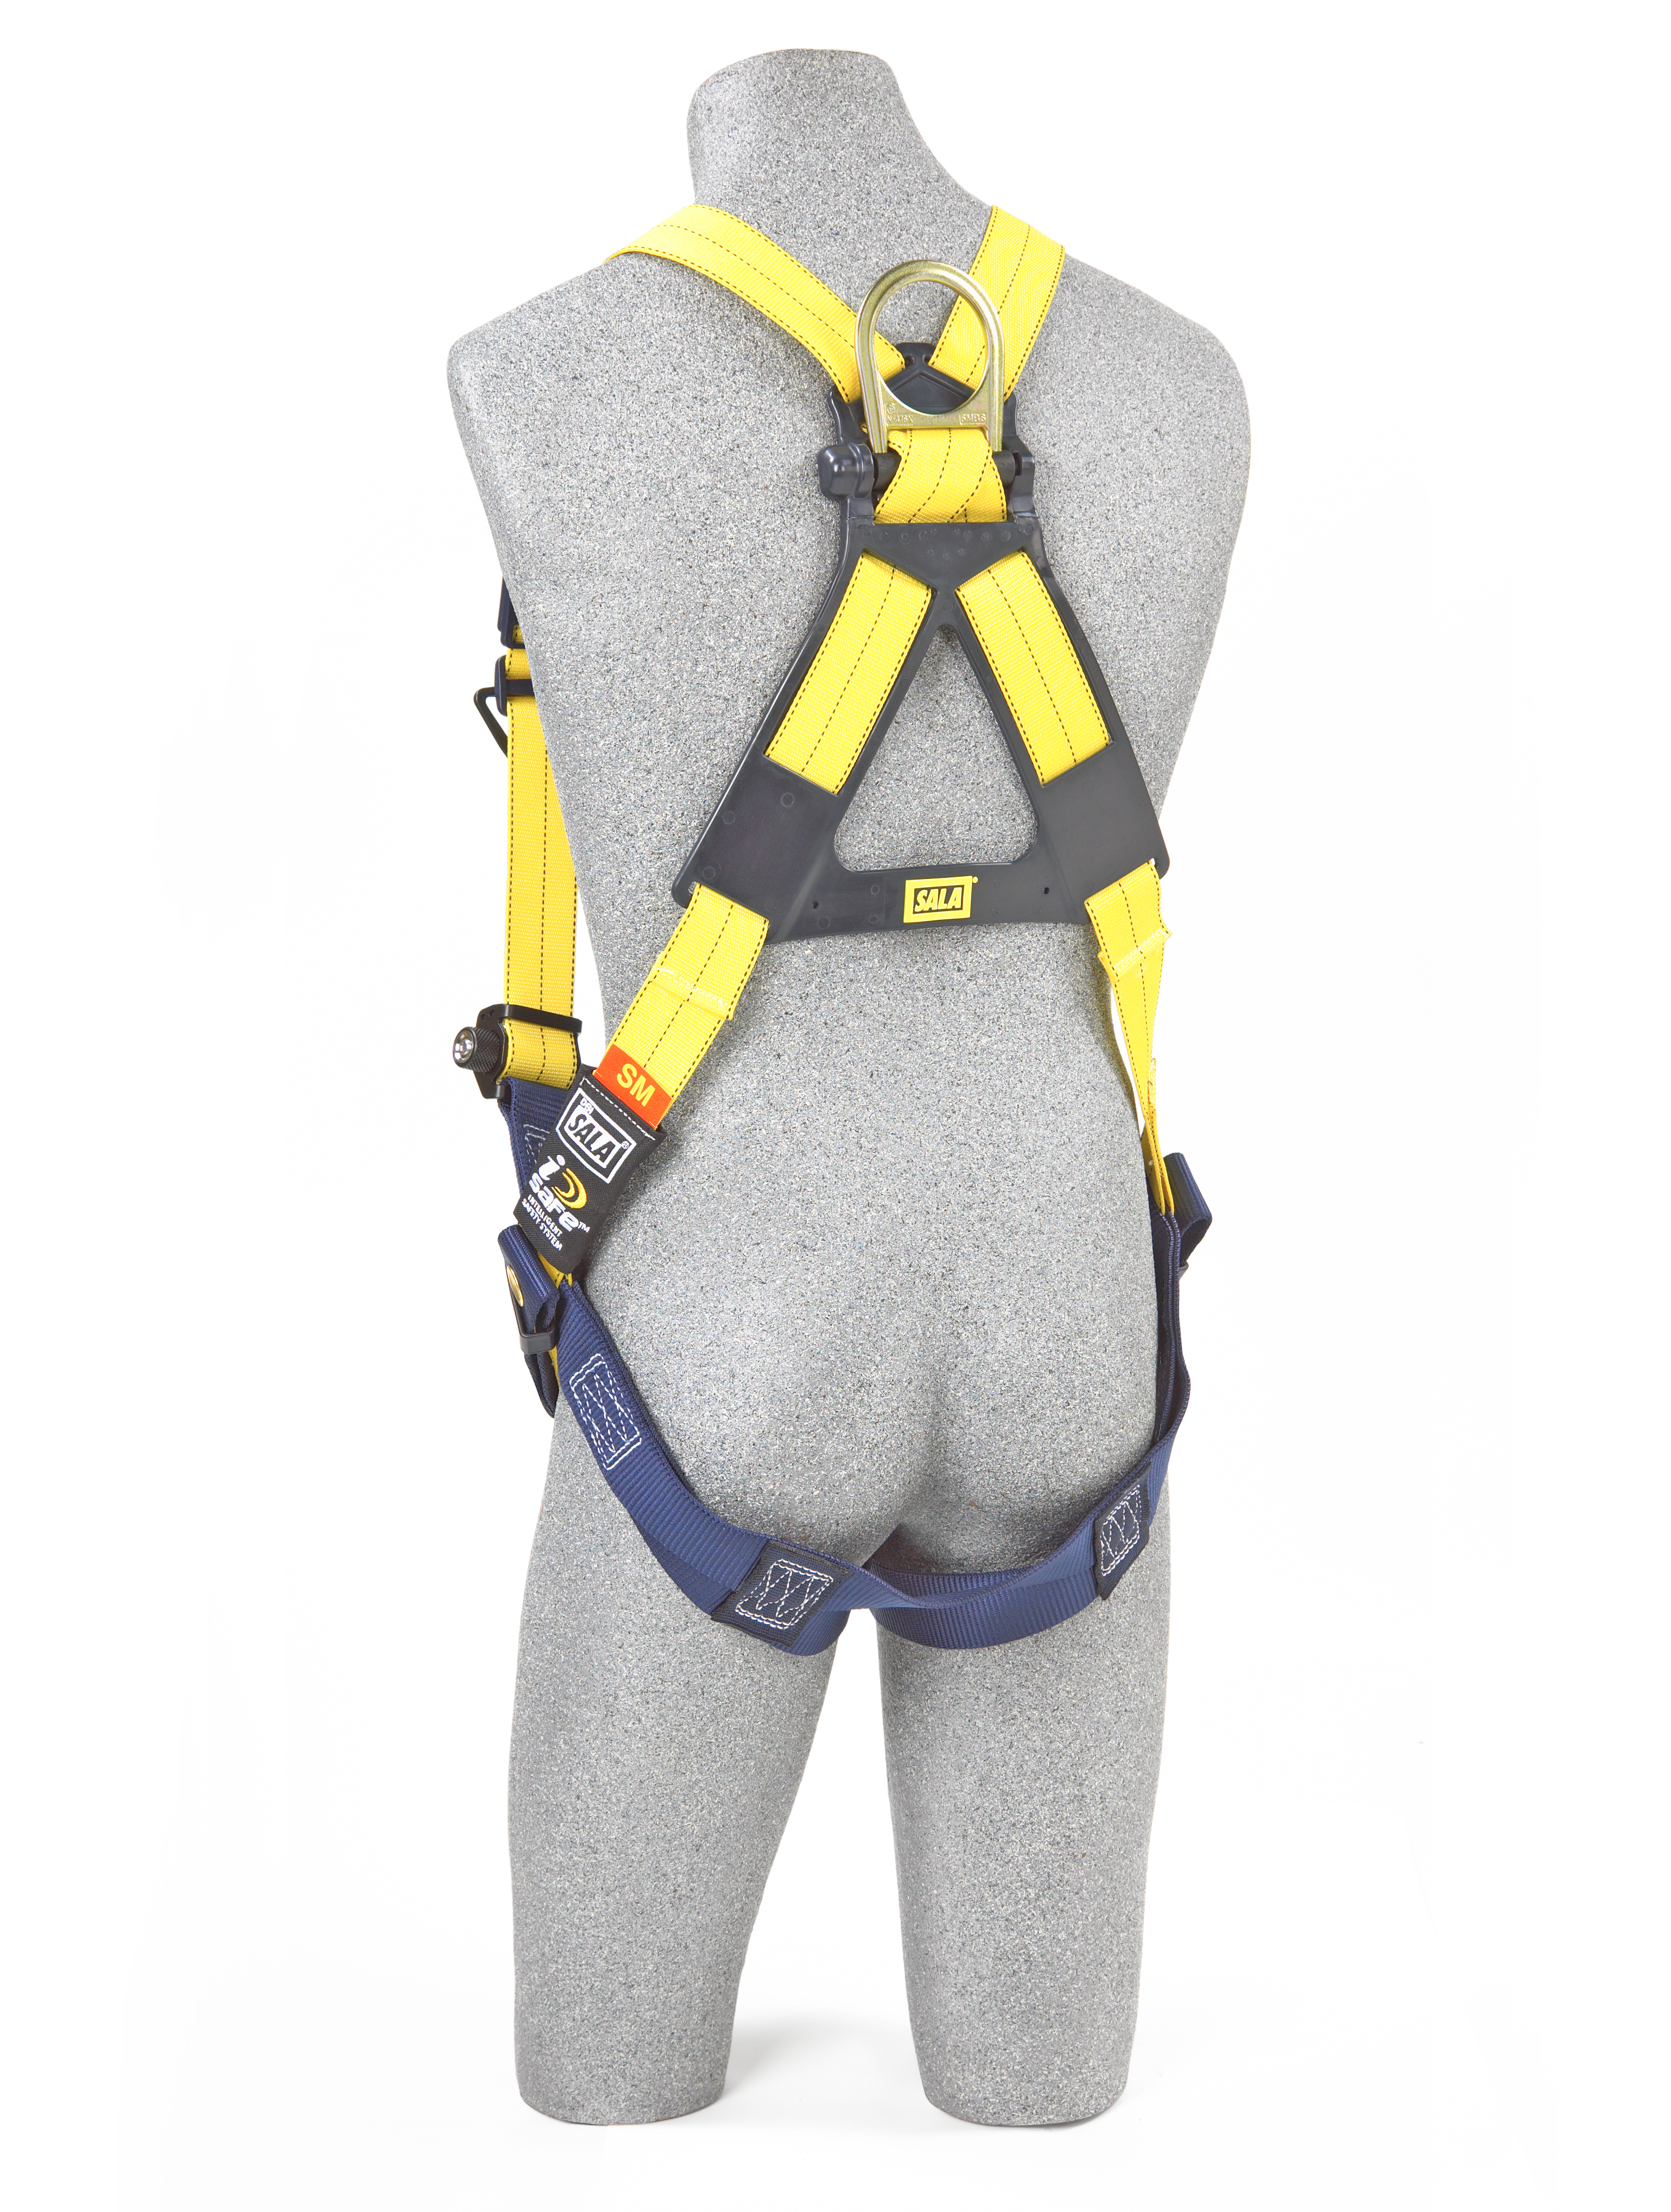 Delta Vest Harness, Pass-Through Chest, Tongue-Buckle Legs, Back